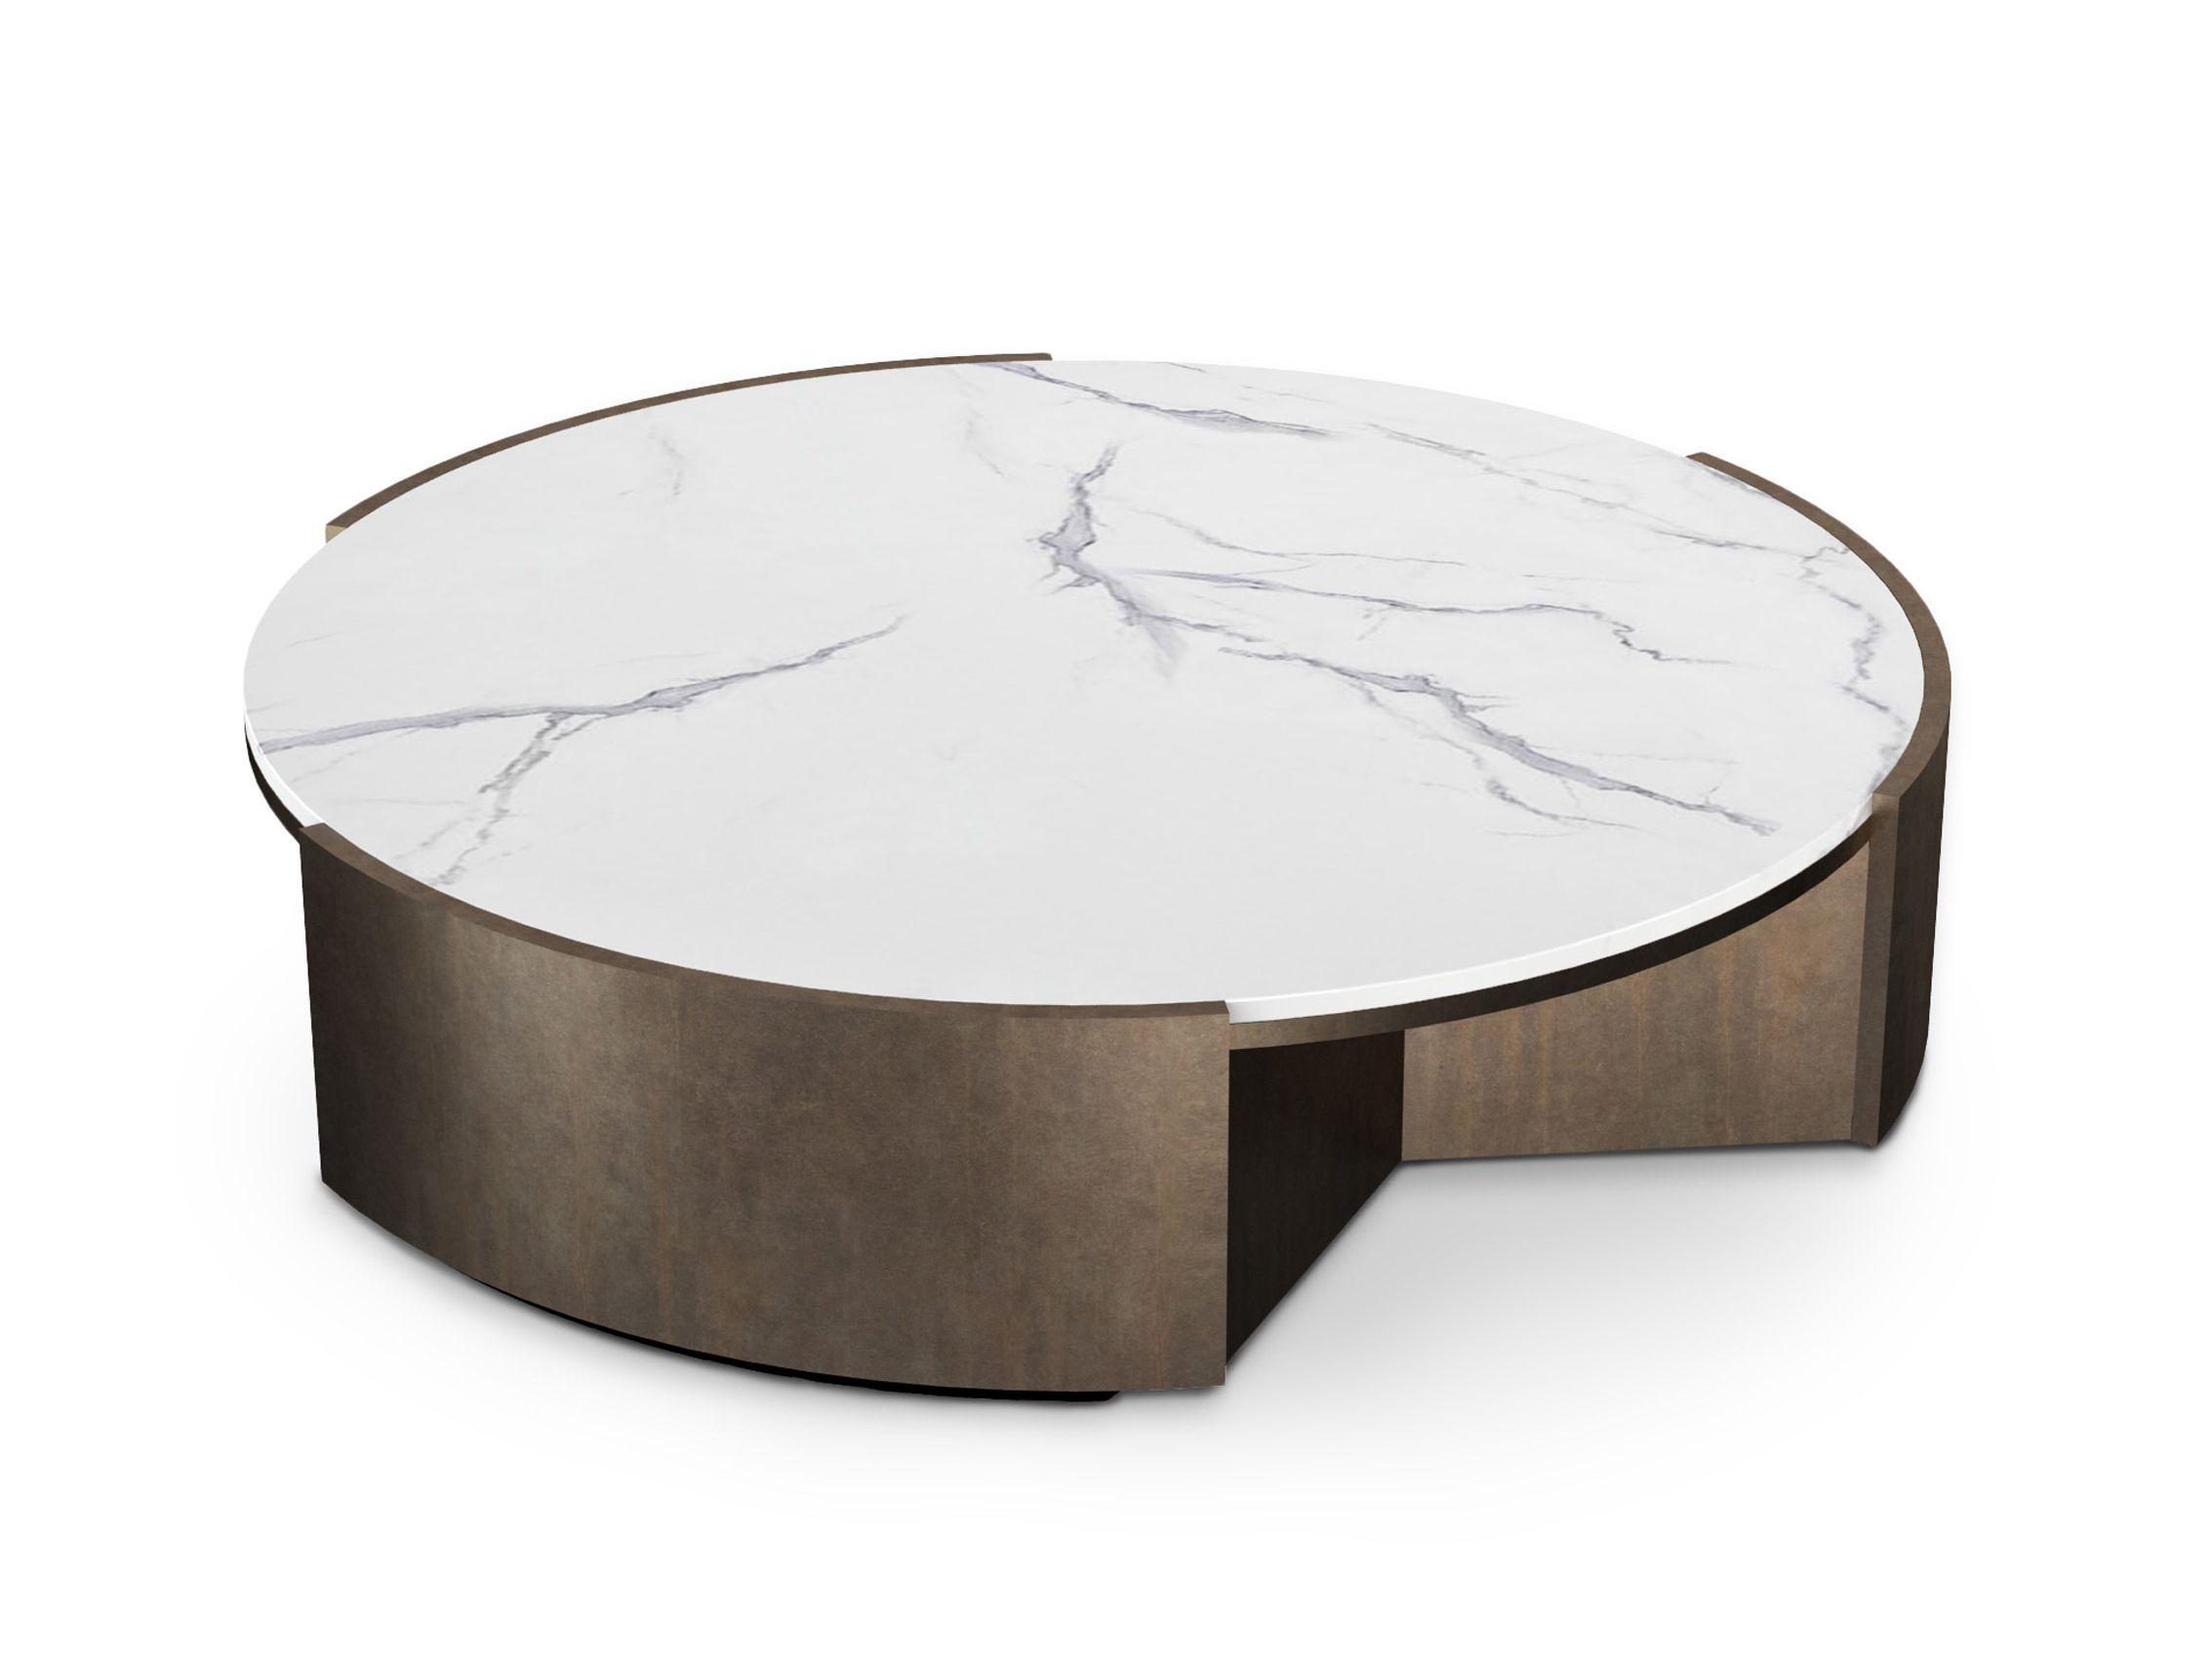 Tl 2170 Coffee Table By Tonino Lamborghini Casa Coffee Table Furniture Marble Coffee Table Coffee Table [ 1700 x 2267 Pixel ]